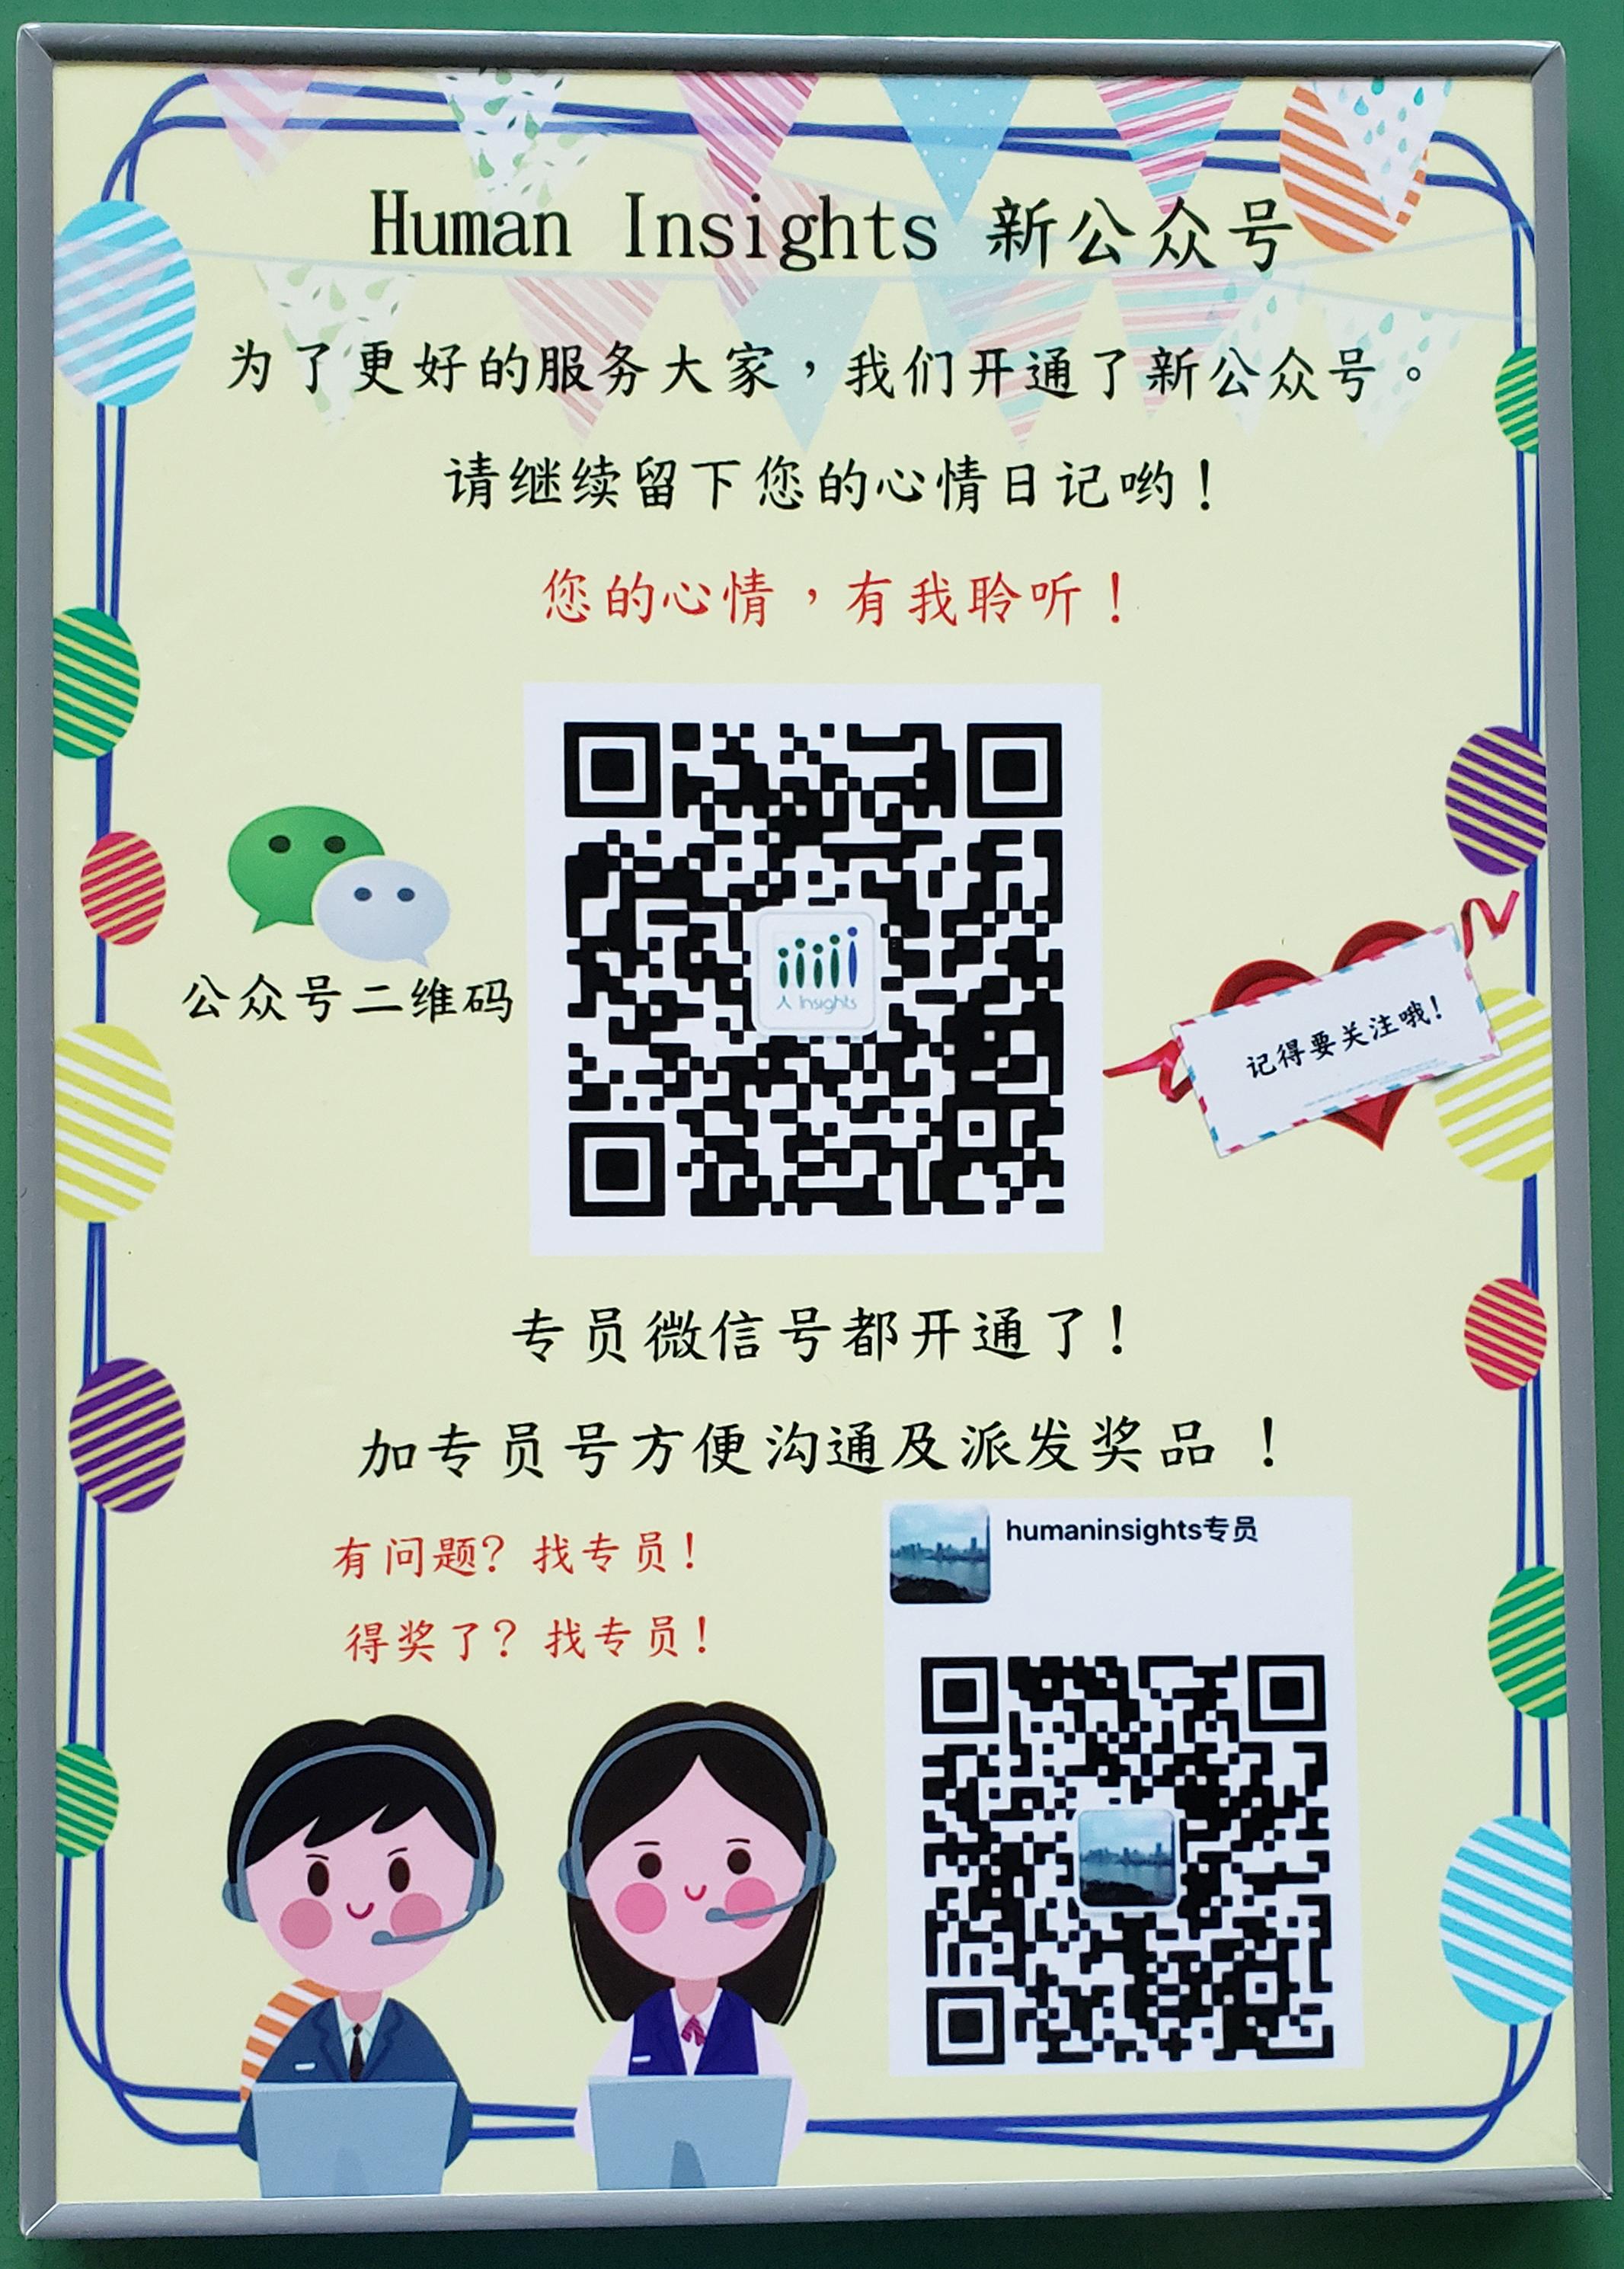 Human Insights Platform Poster